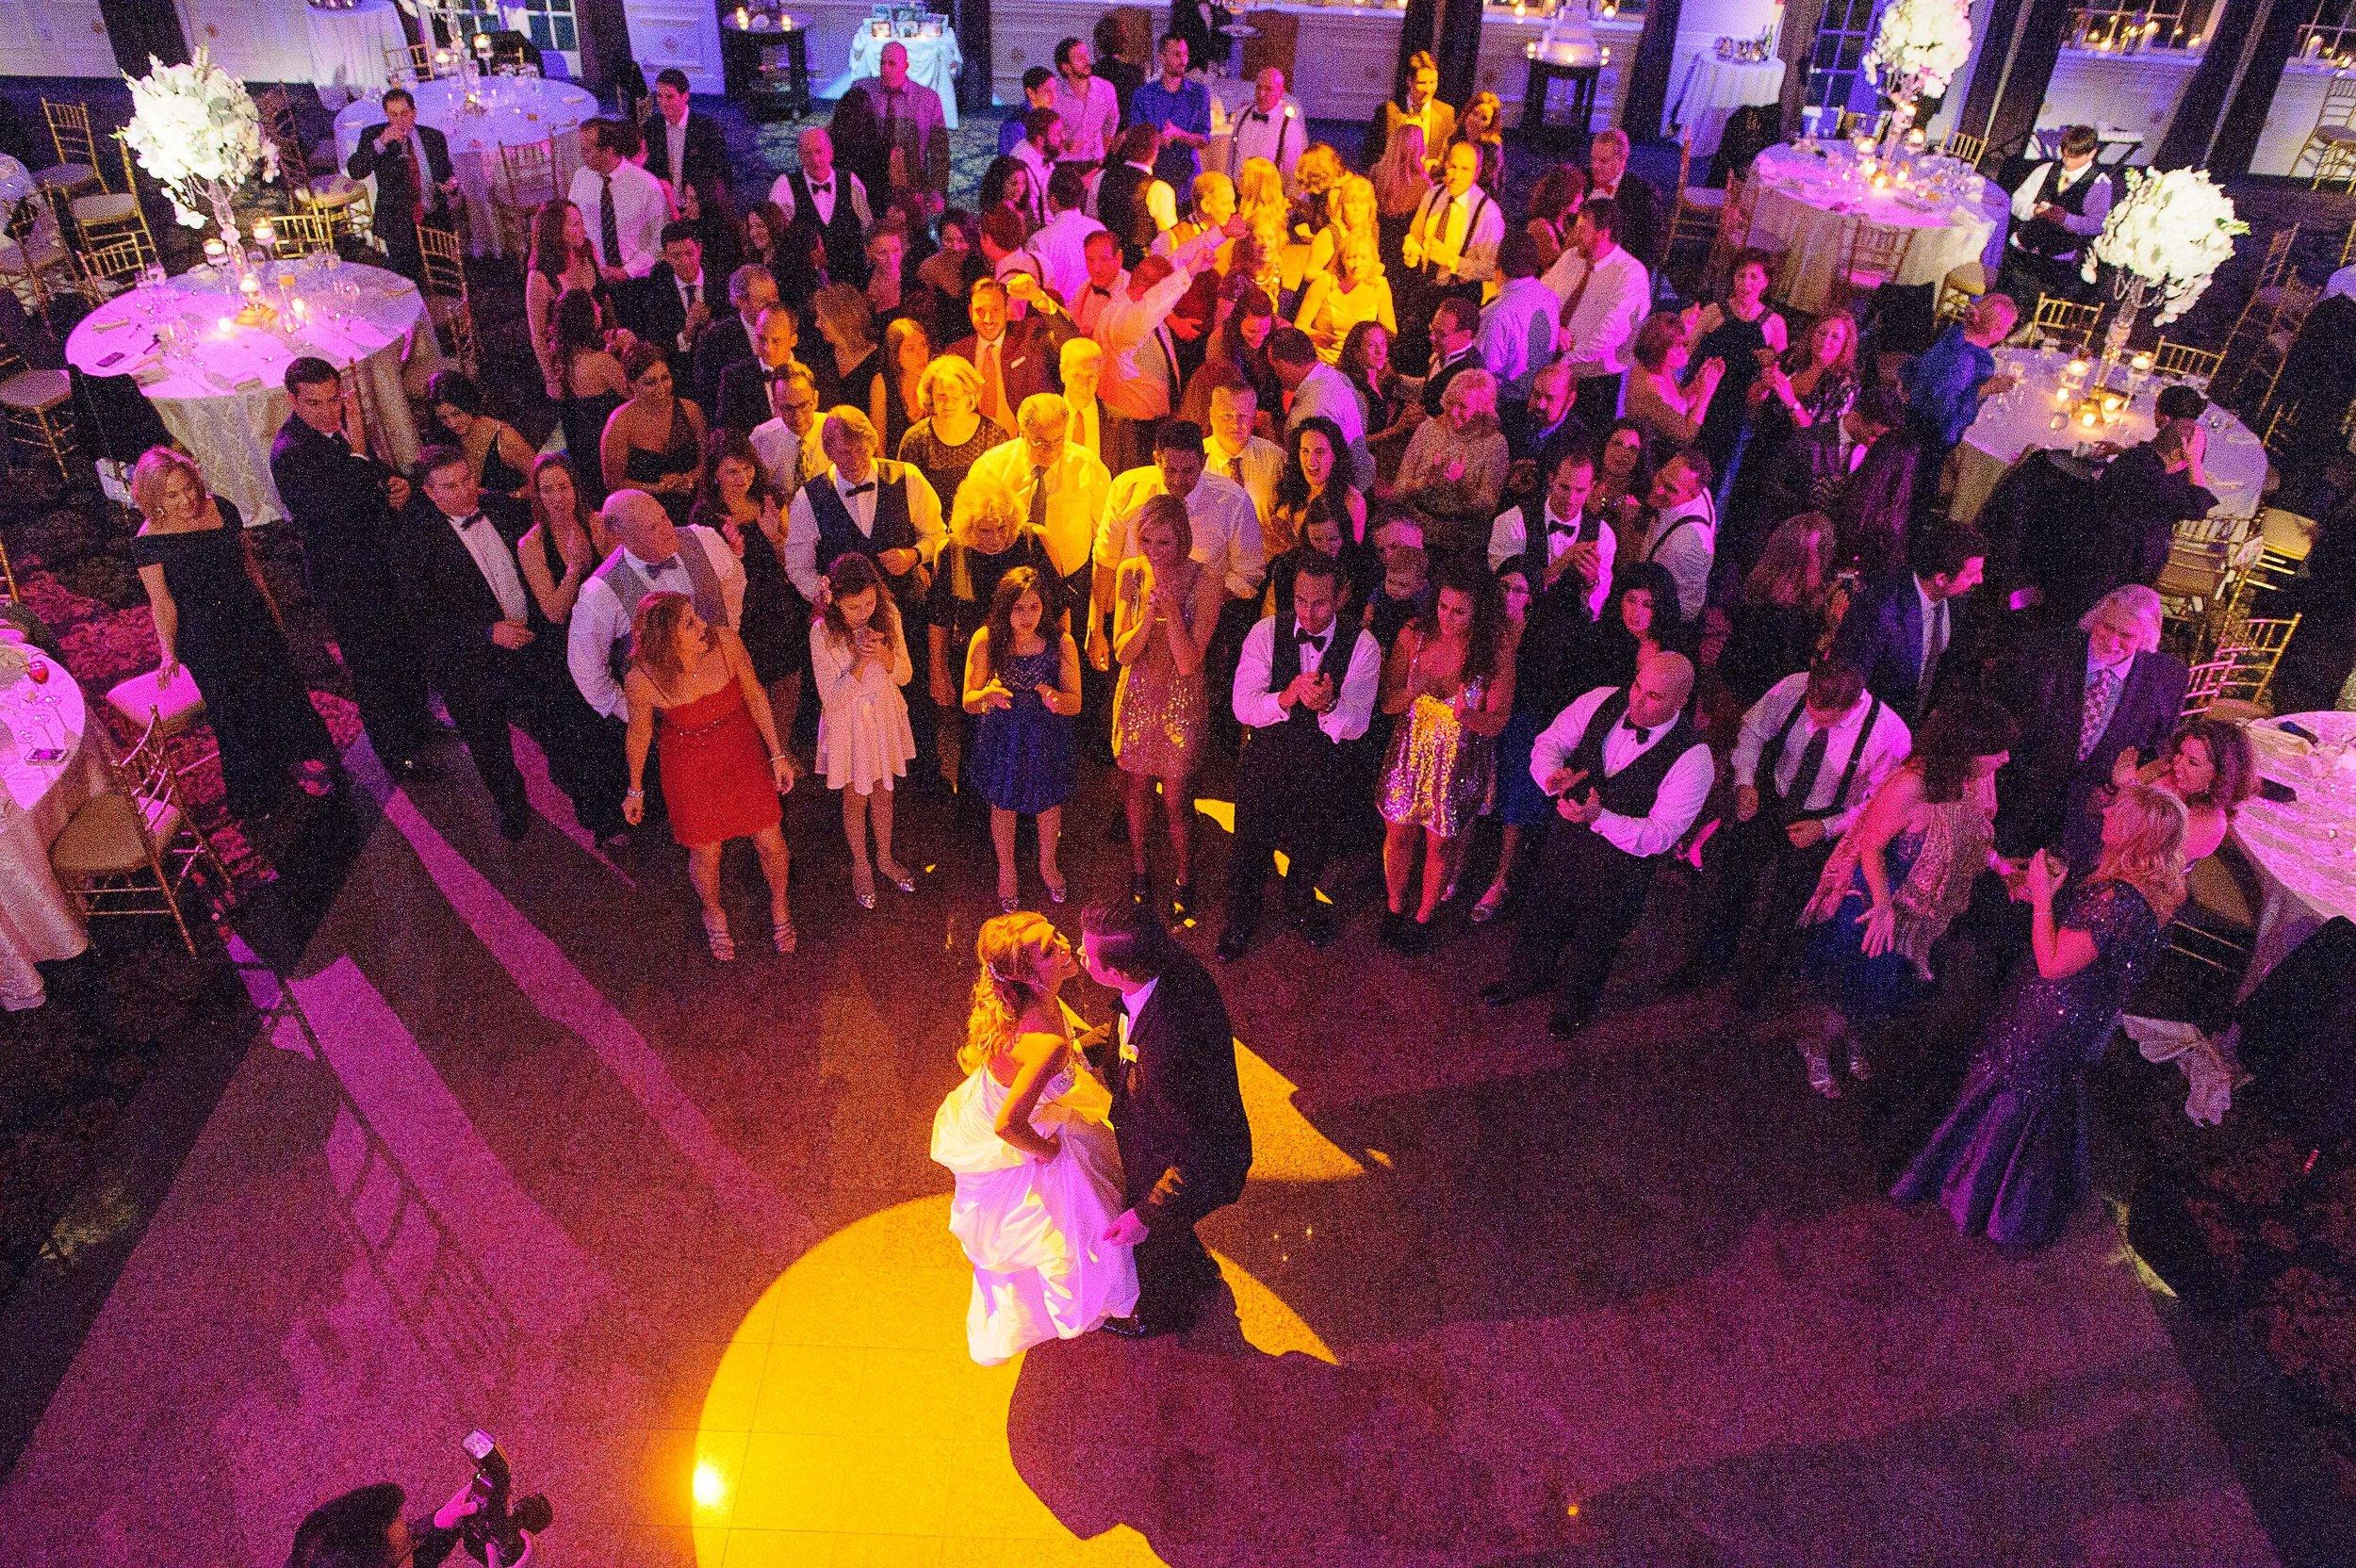 Ceci_New_York_Custom_Invitation_ New_Jersey_Wedding_Luxury_Personalized_Ceci_Style_Bride_Foil_Stamping124.JPG